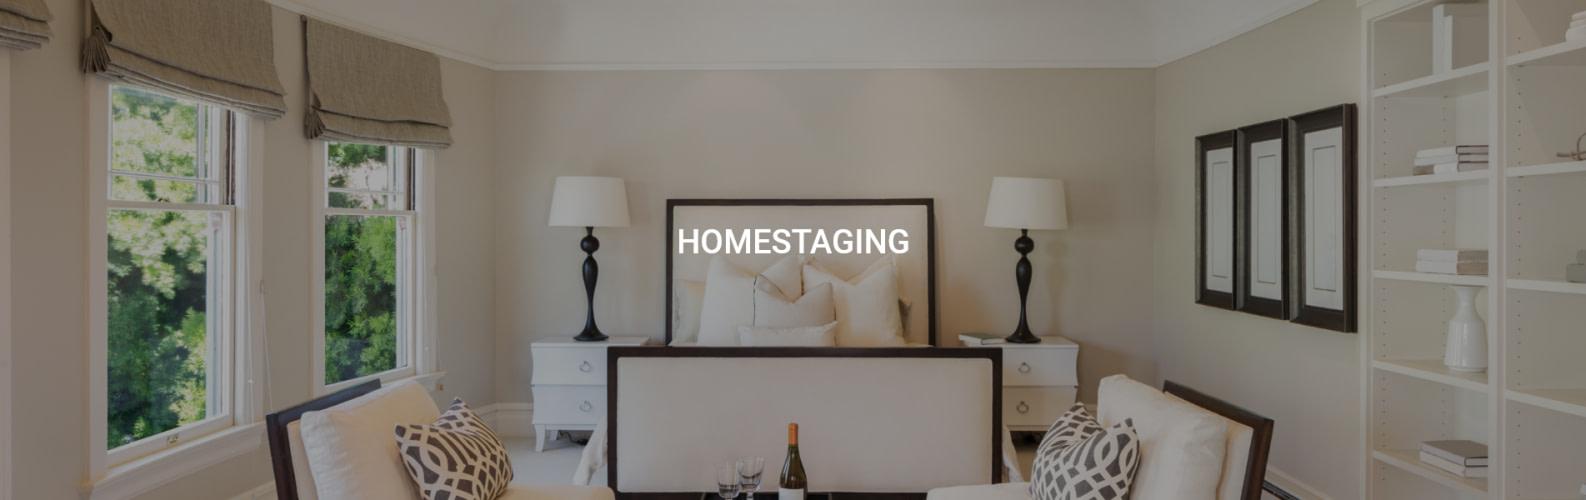 Screenshot 2021-10-20 at 20-06-12 Homestaging – Schlüsselfertig Immobilien